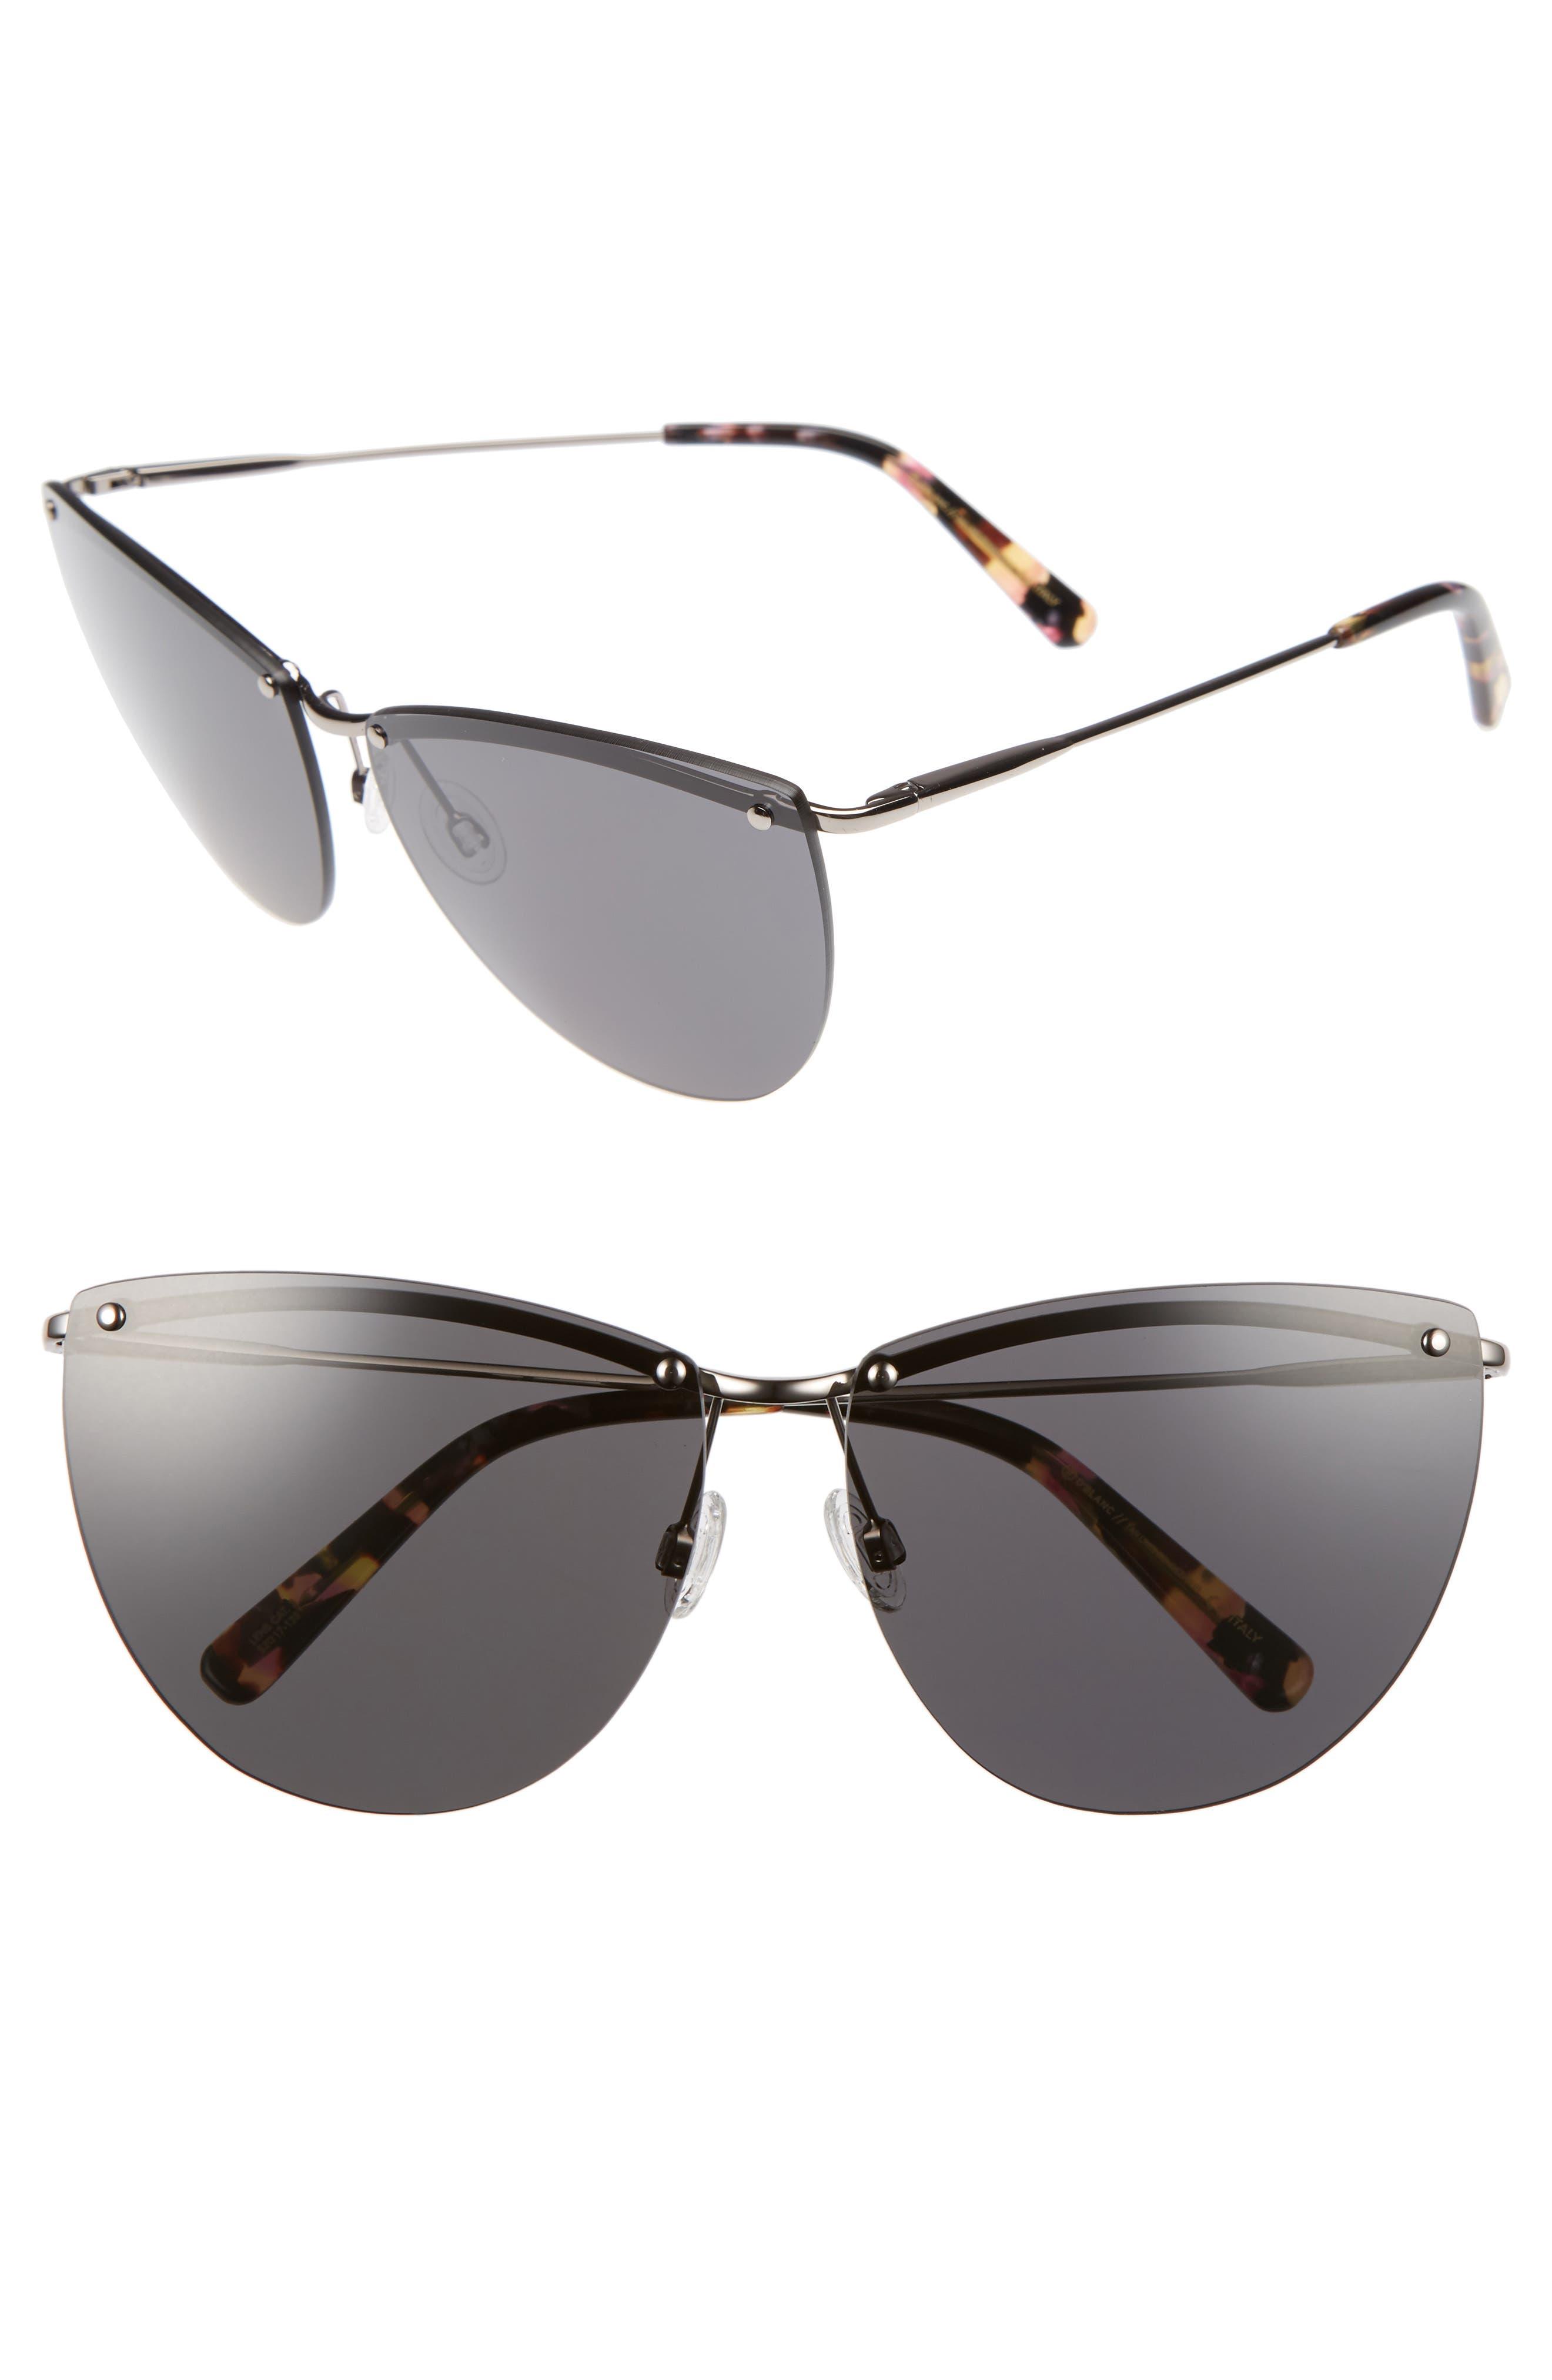 DBLANC DBLANC Tan Lines Rendezvous 61mm Cat Eye Sunglasses